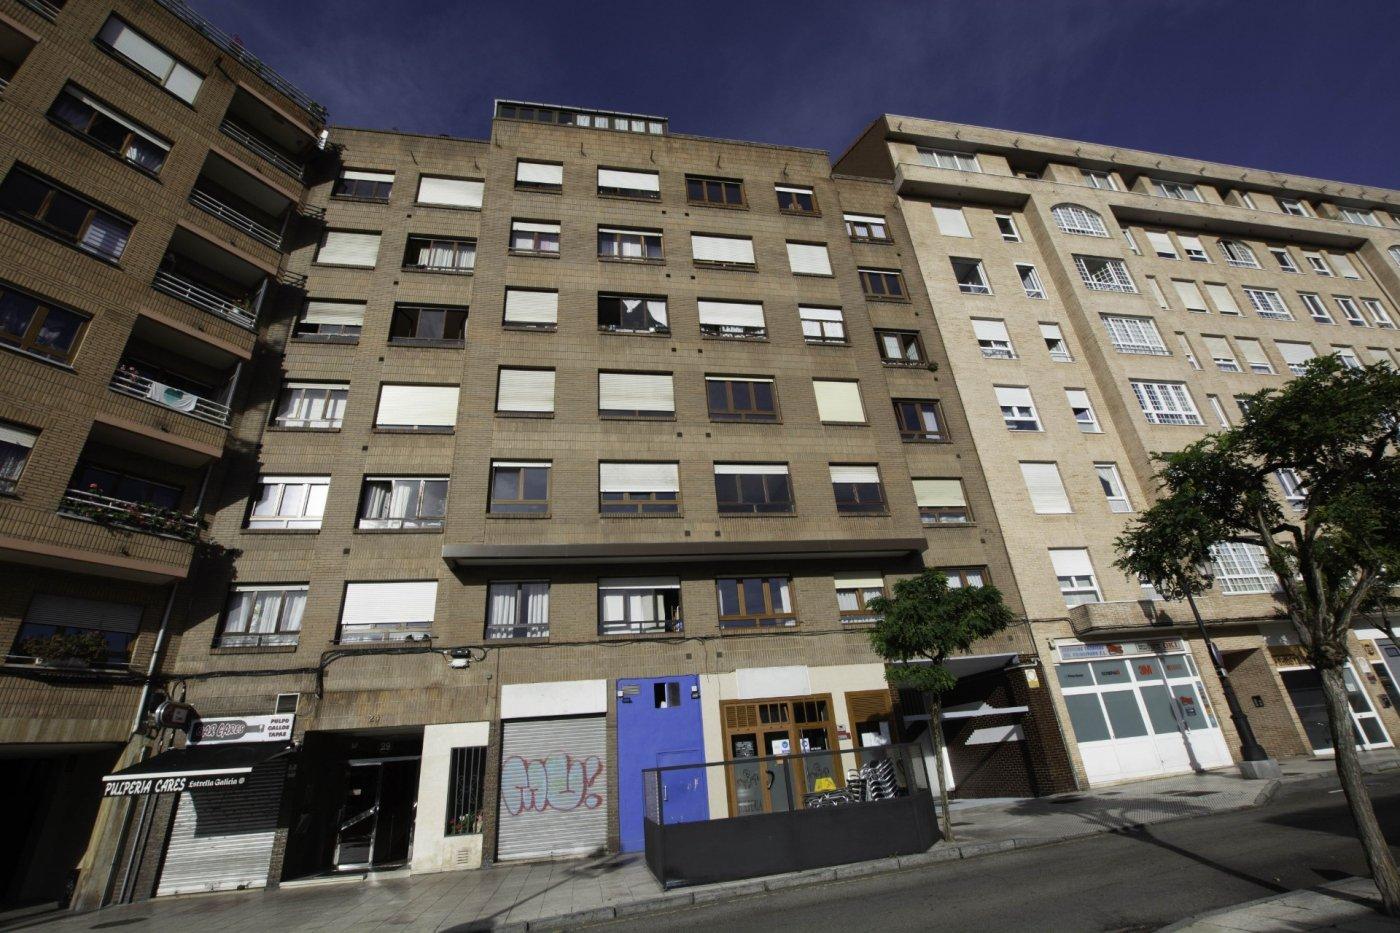 Apartamento en vallobin - imagenInmueble17